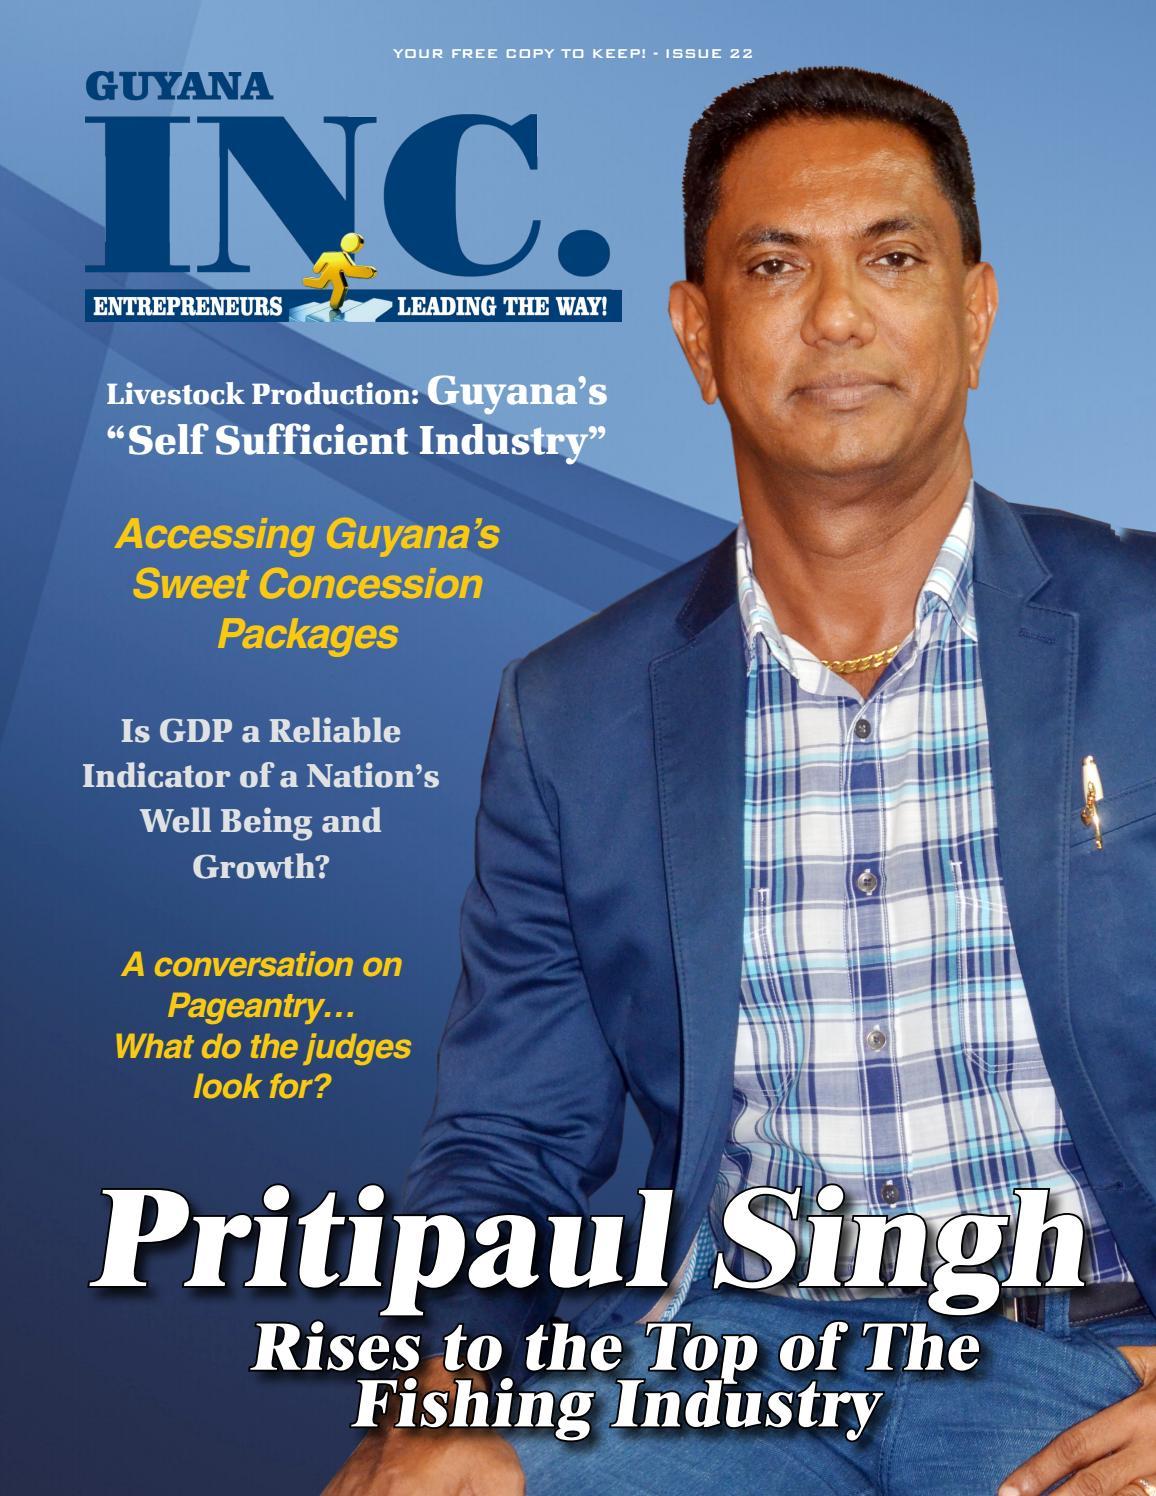 Guyana Inc Magazine Issue 22 by Frank Sanichara - issuu